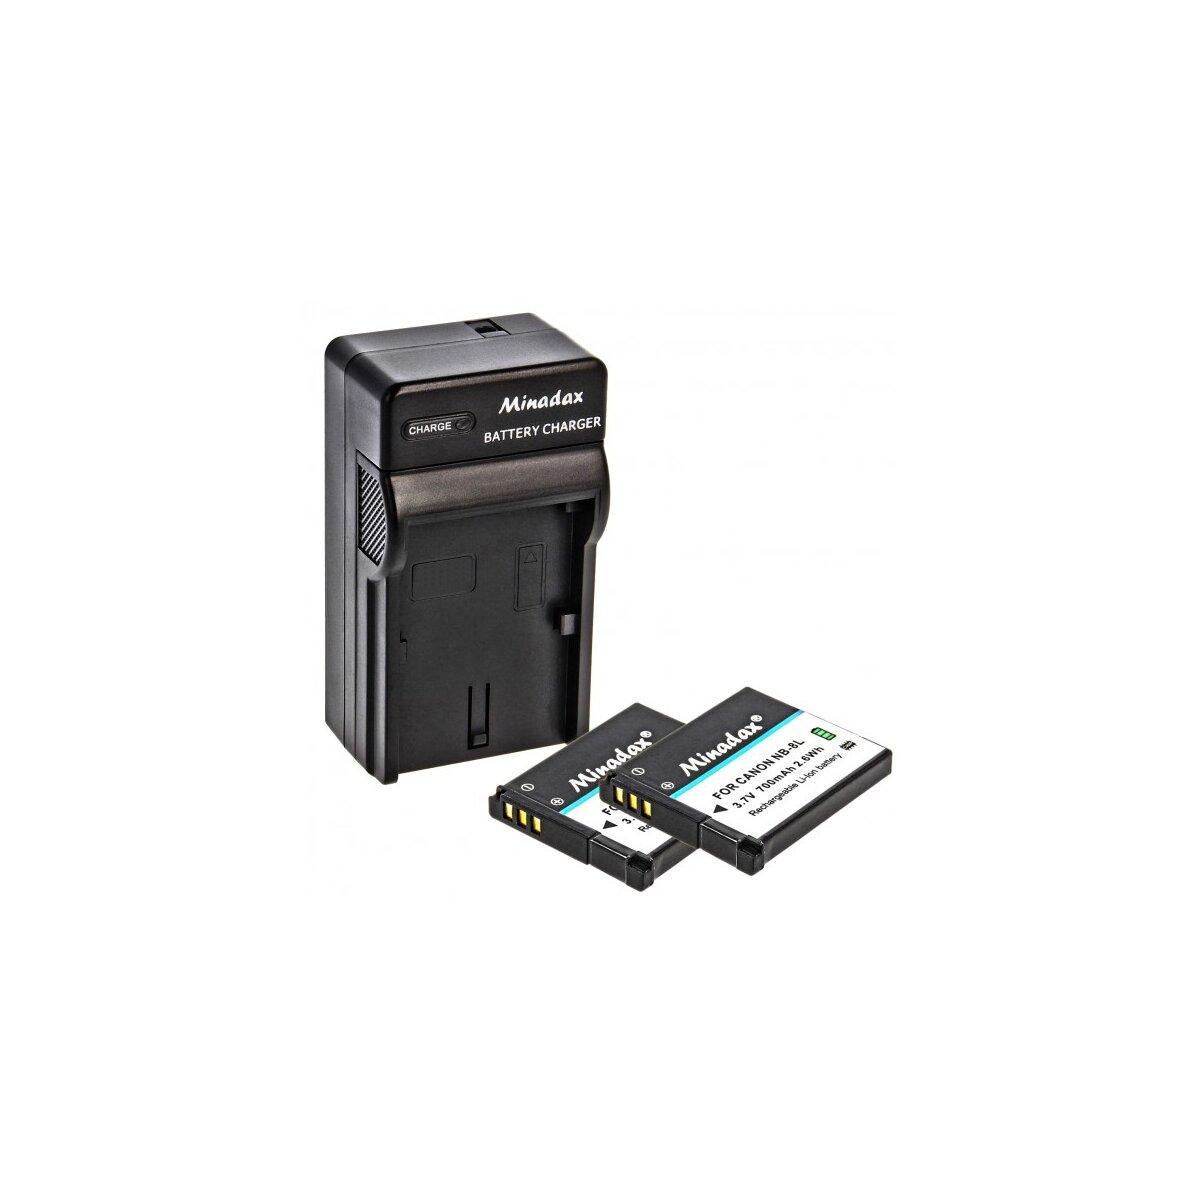 Minadax® Ladegerät 100% kompatibel kompatibel mit Canon NB-8L inkl. Auto Ladekabel, Ladeschale austauschbar + 2x Akku Ersatz für NB-8L